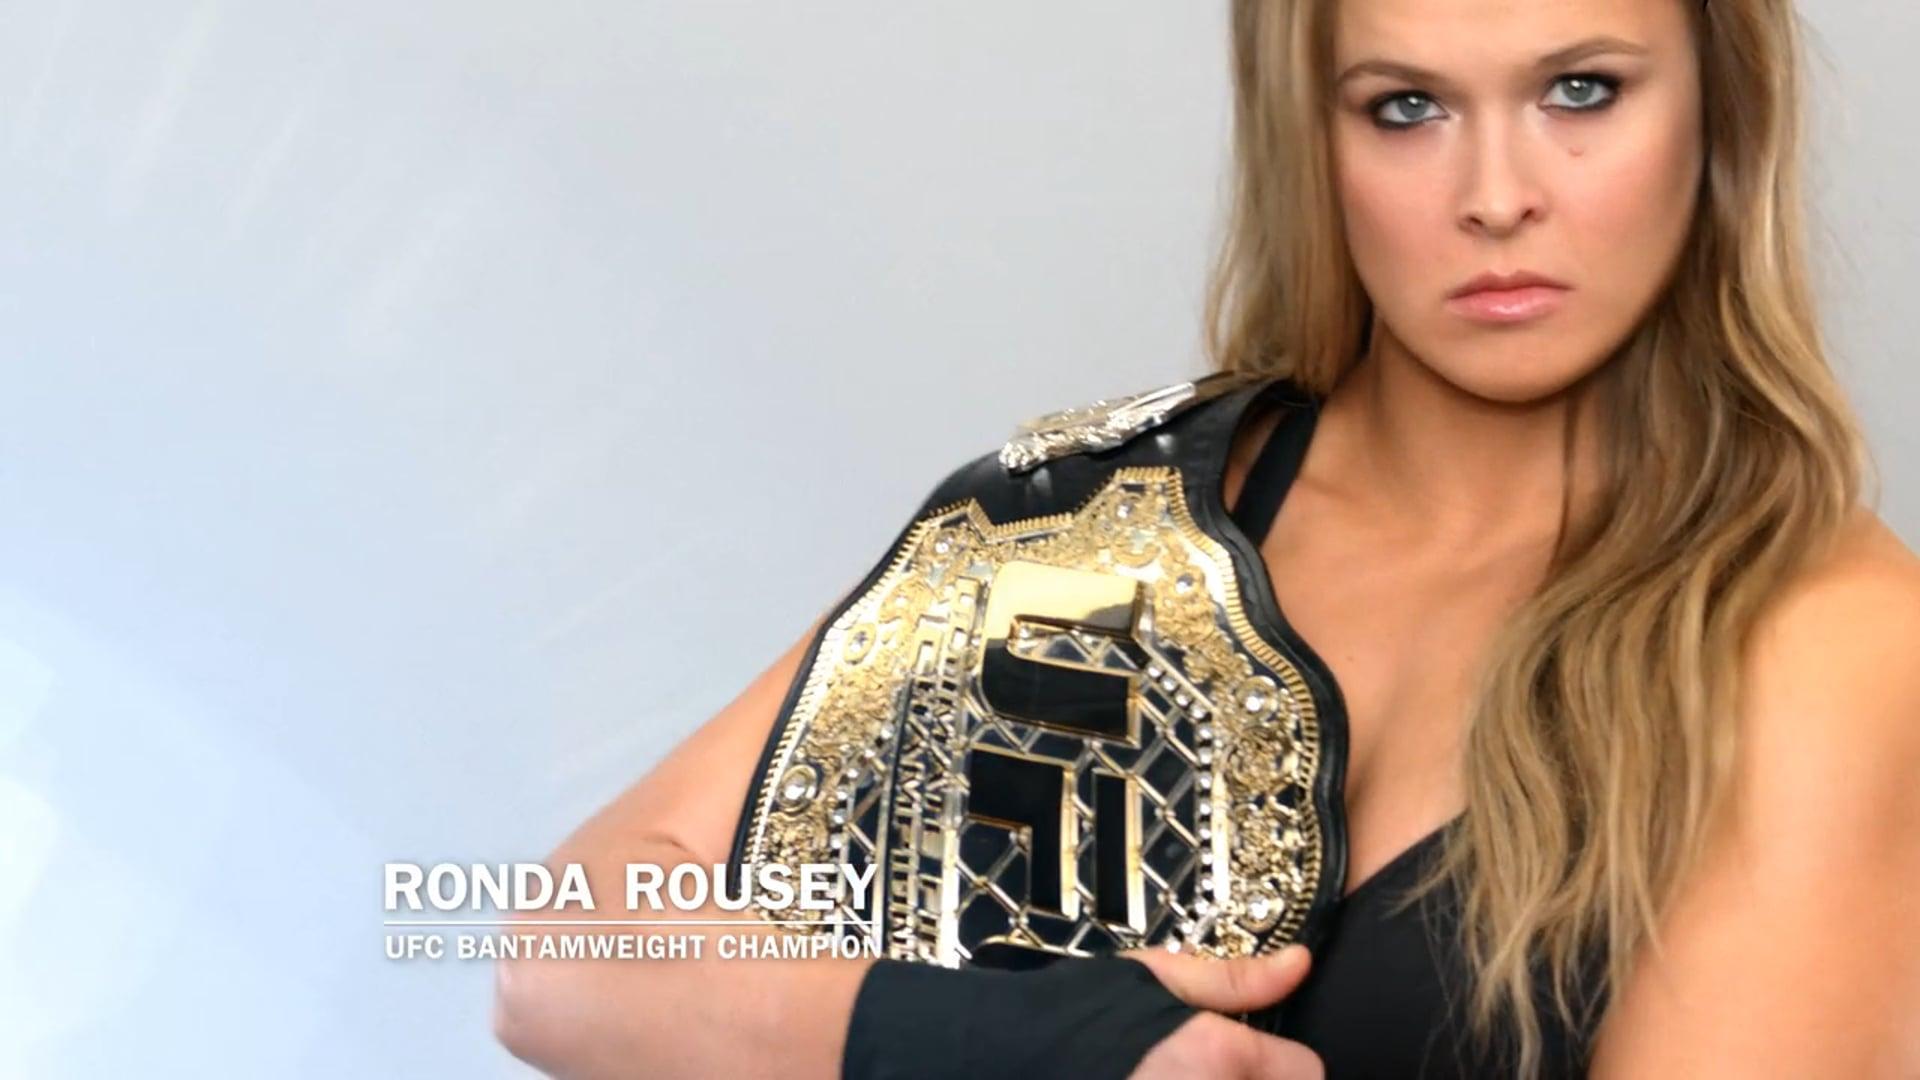 Ronda Rousey -Cinnamon Swirl French Toast Breakfast Sandwich - :30